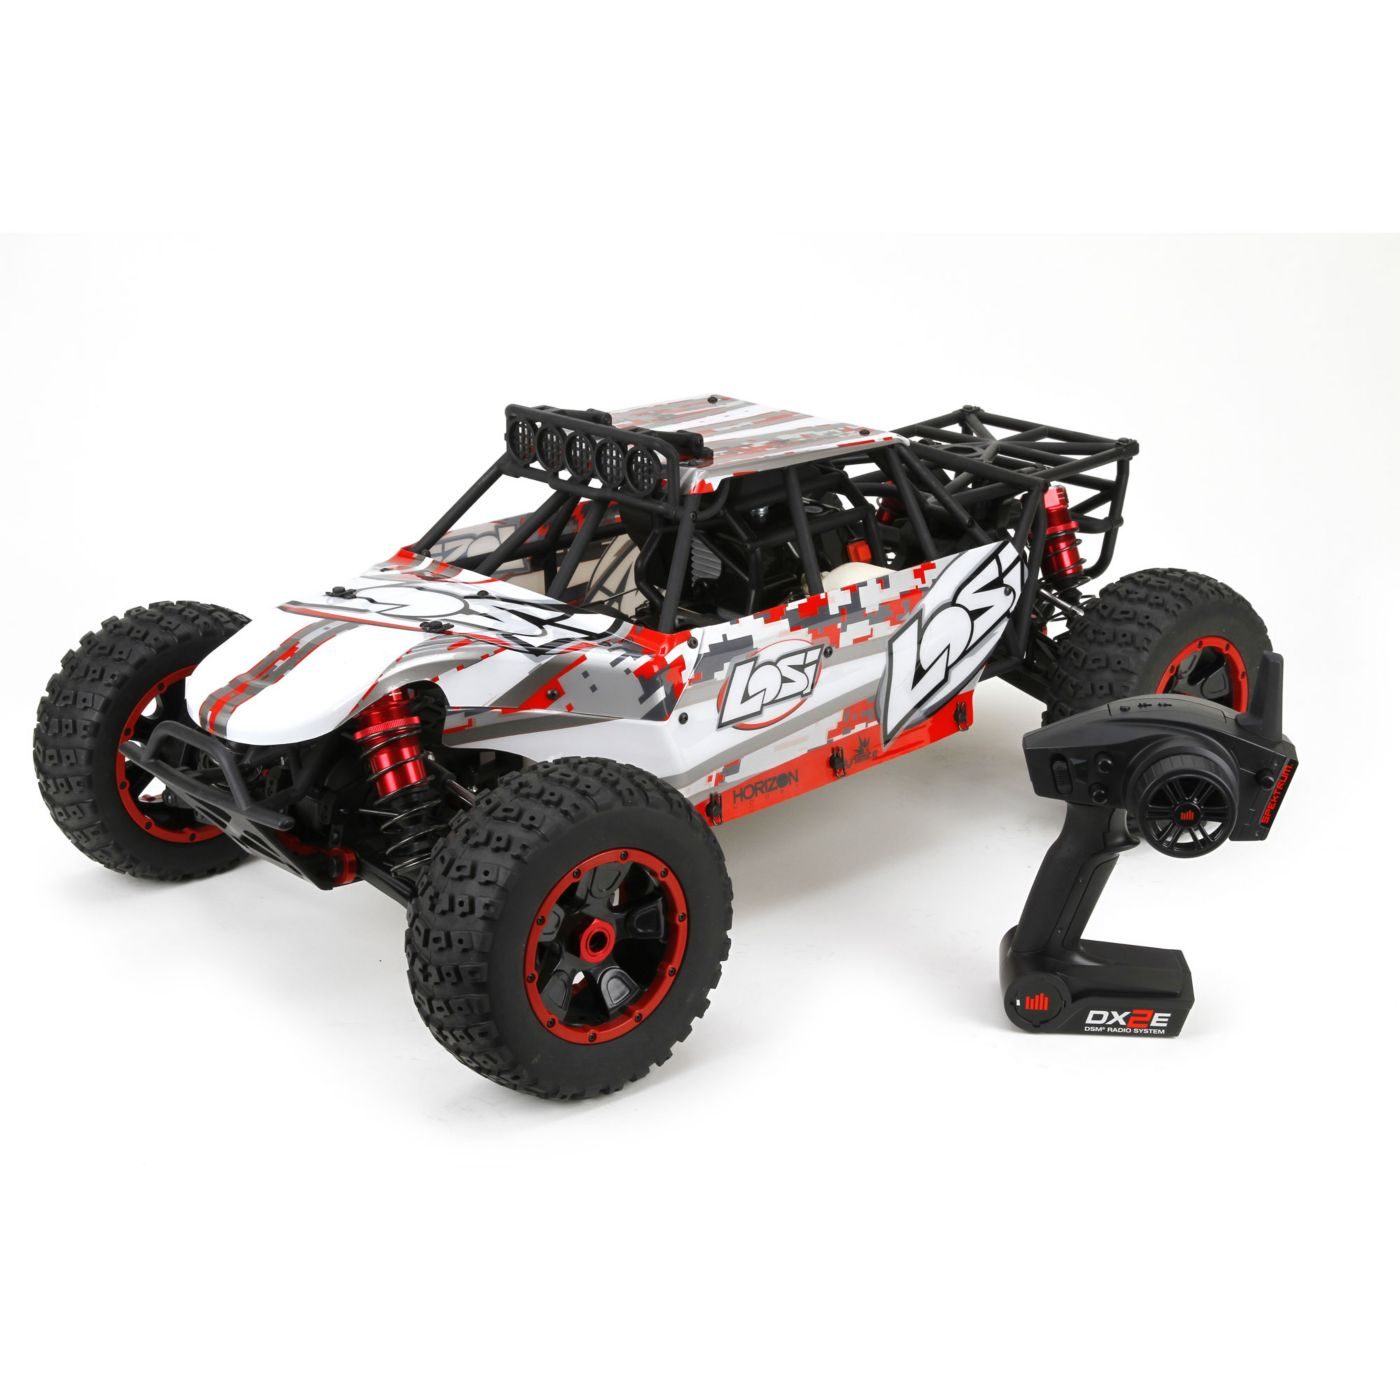 Team Losi Радиоуправляемая машина Багги 1/5 4x4 - Desert Buggy XL:1/5th 4WD RTR